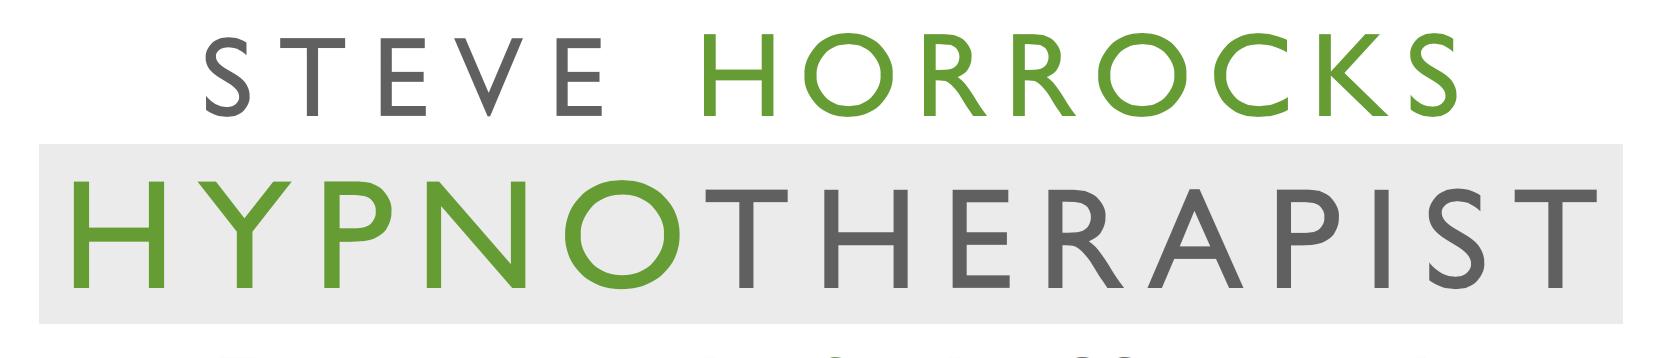 Steve Horrocks Hypnotherapist, Norfolk